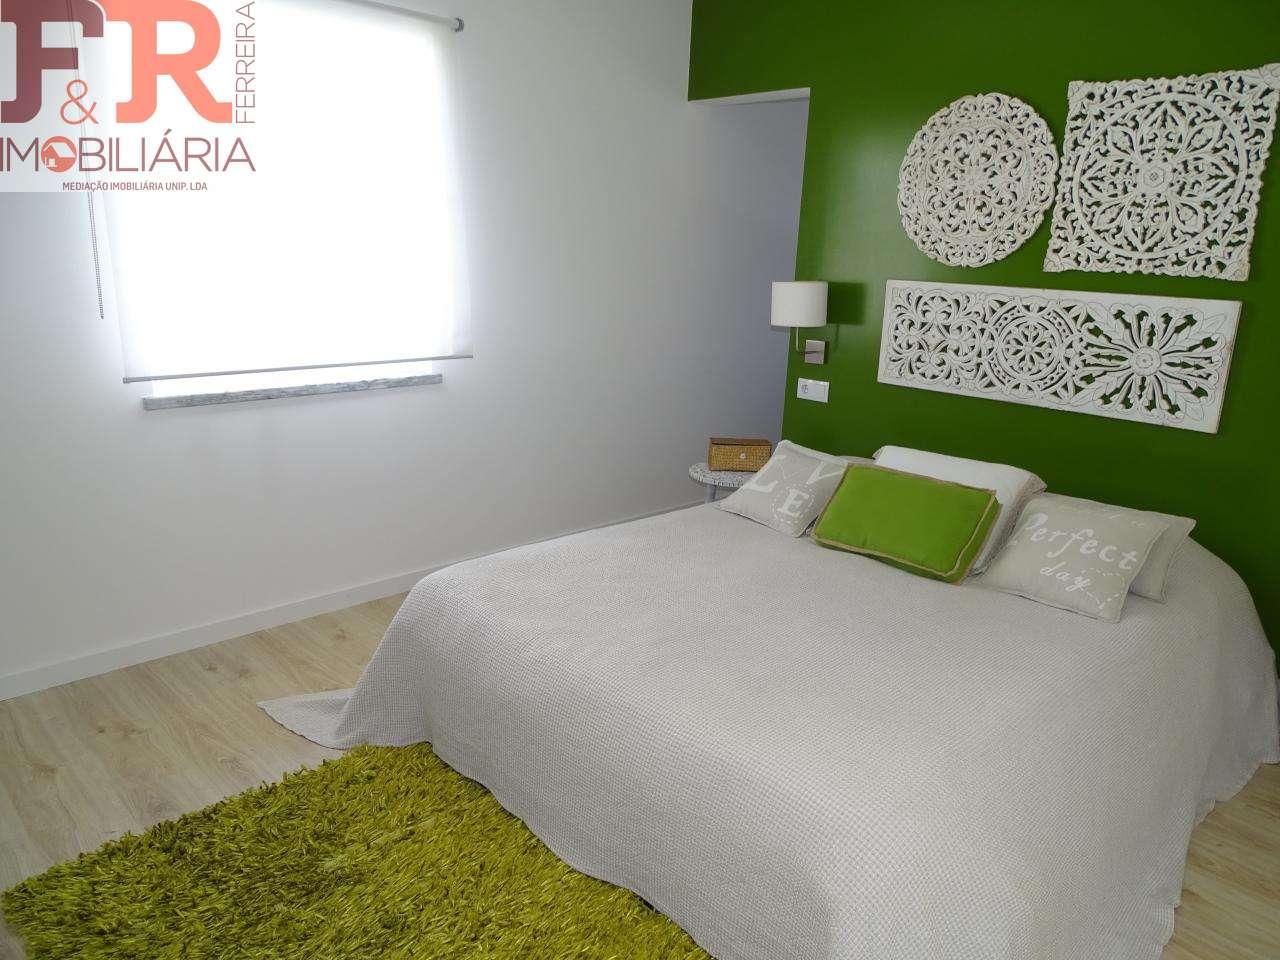 Apartamento para comprar, Quinta do Conde, Setúbal - Foto 28